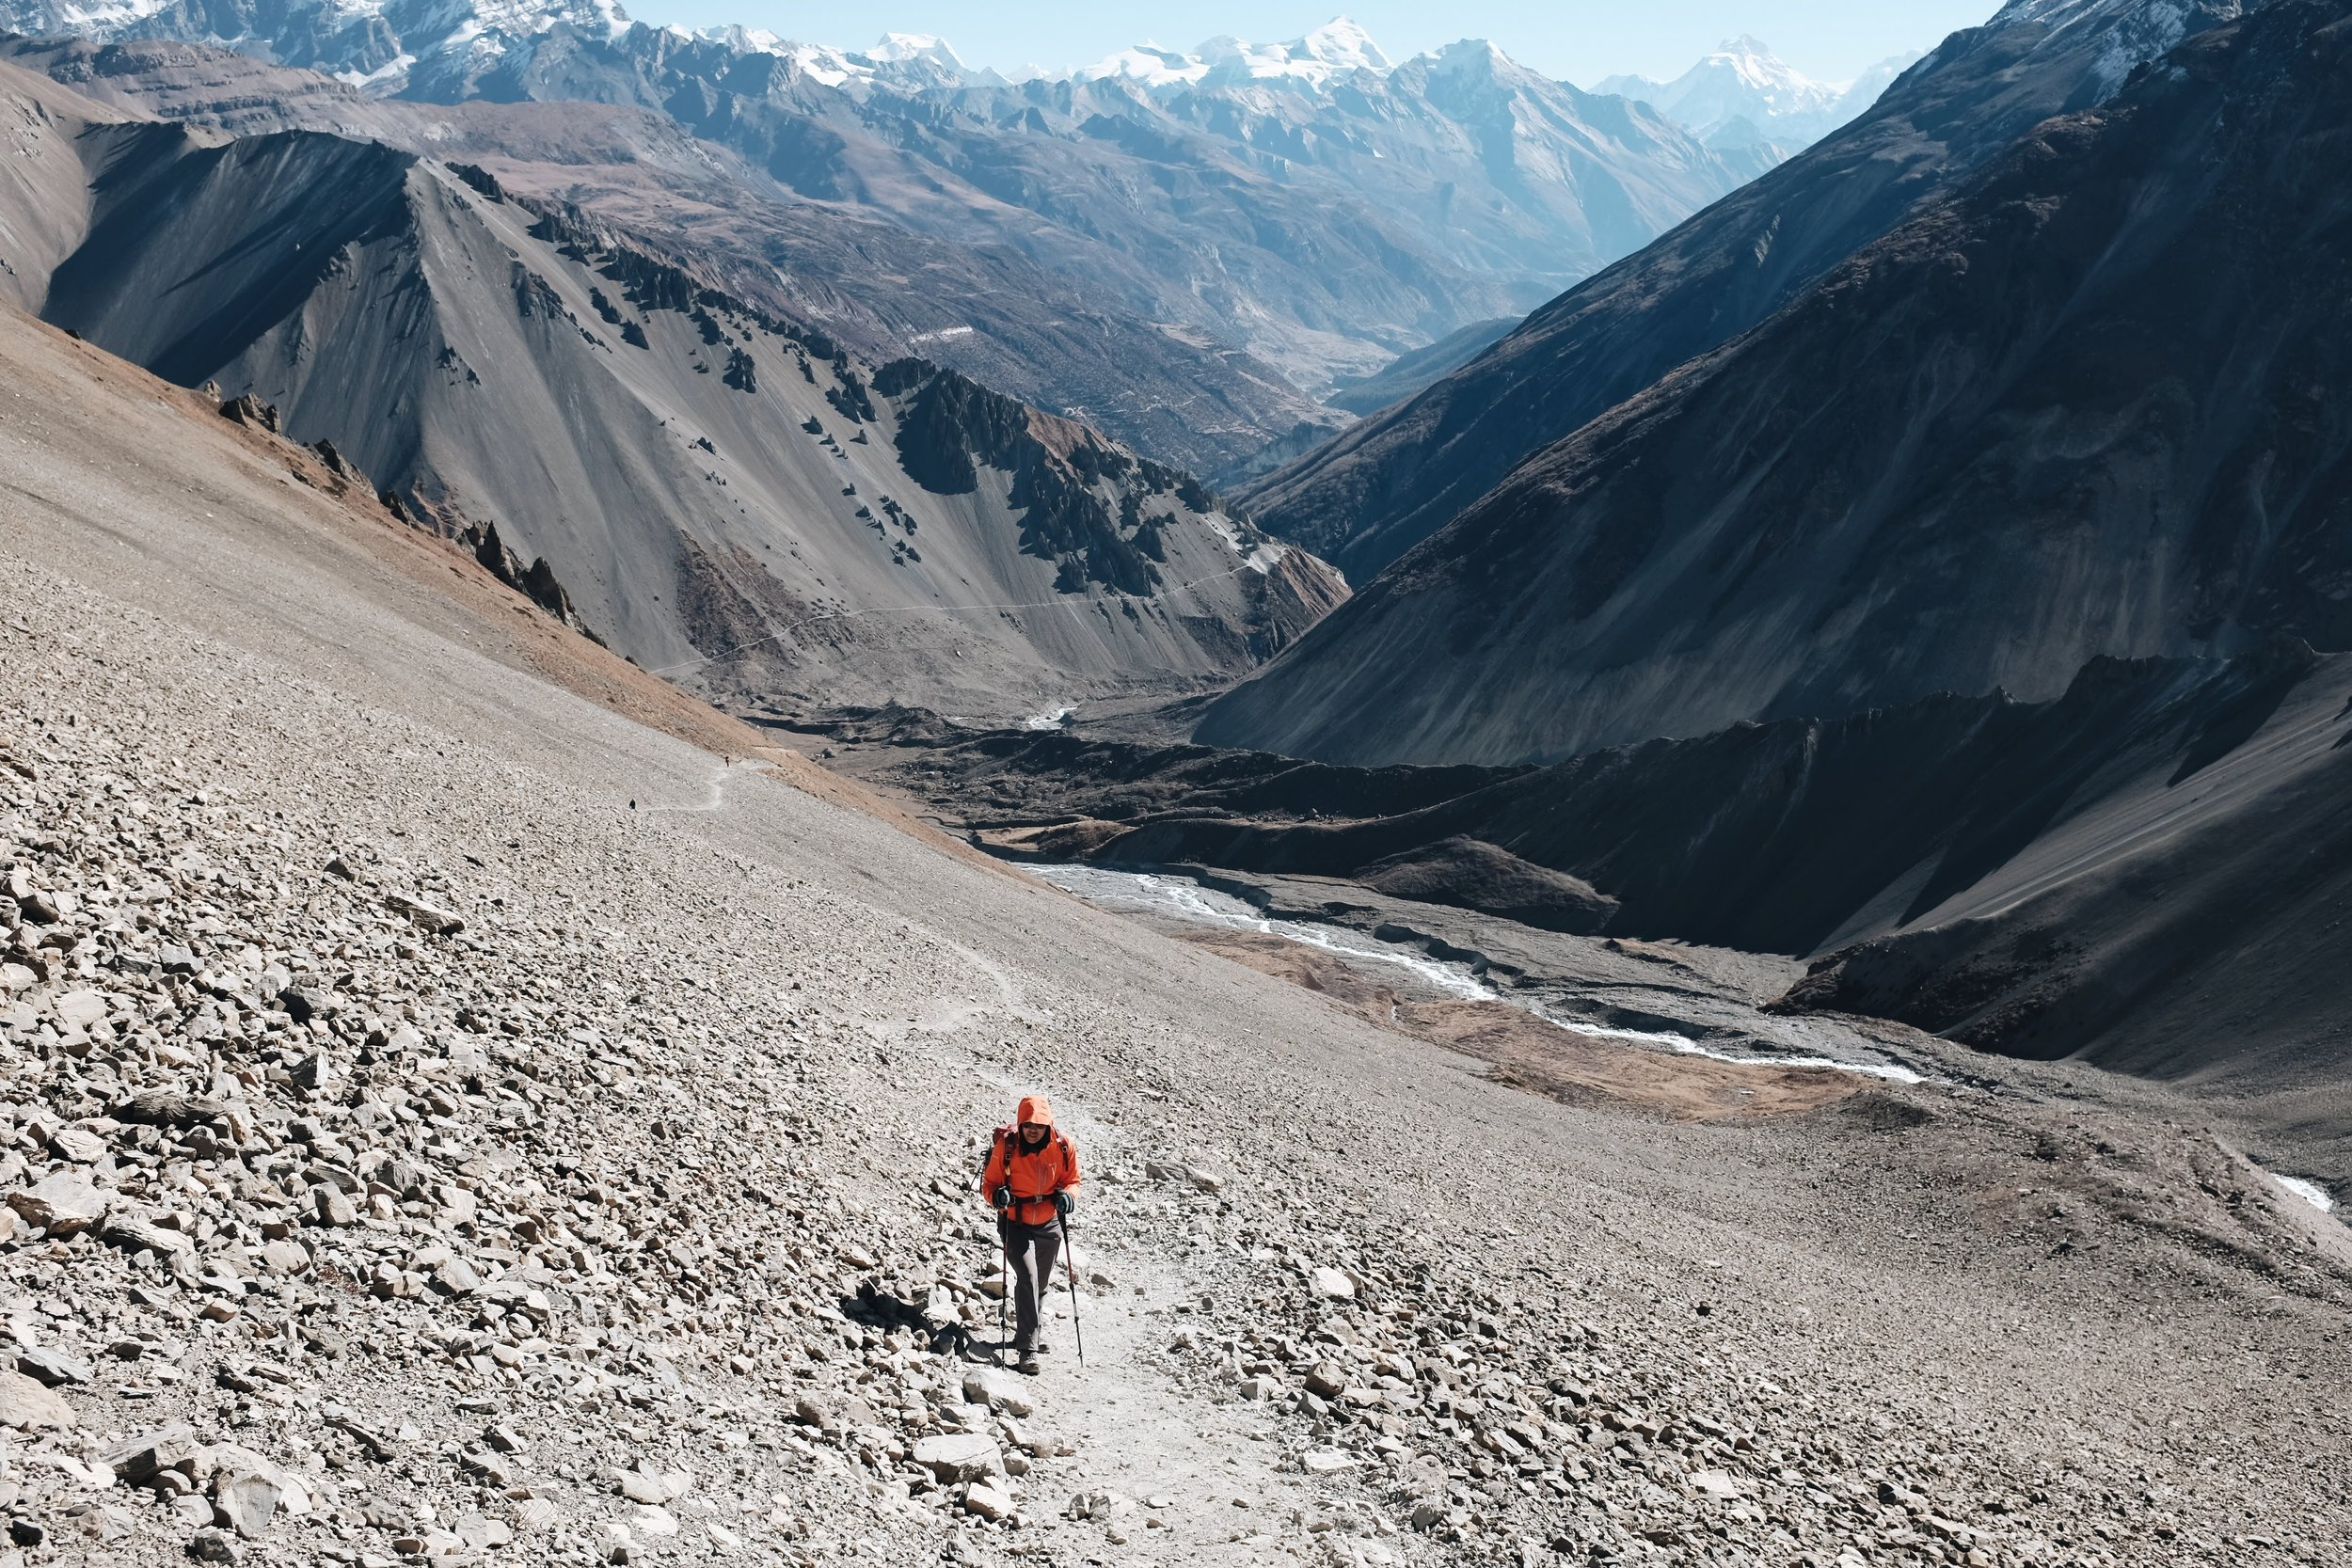 Jackie Antig, Founder, trekking the Annapurna Circuit in Nepal.